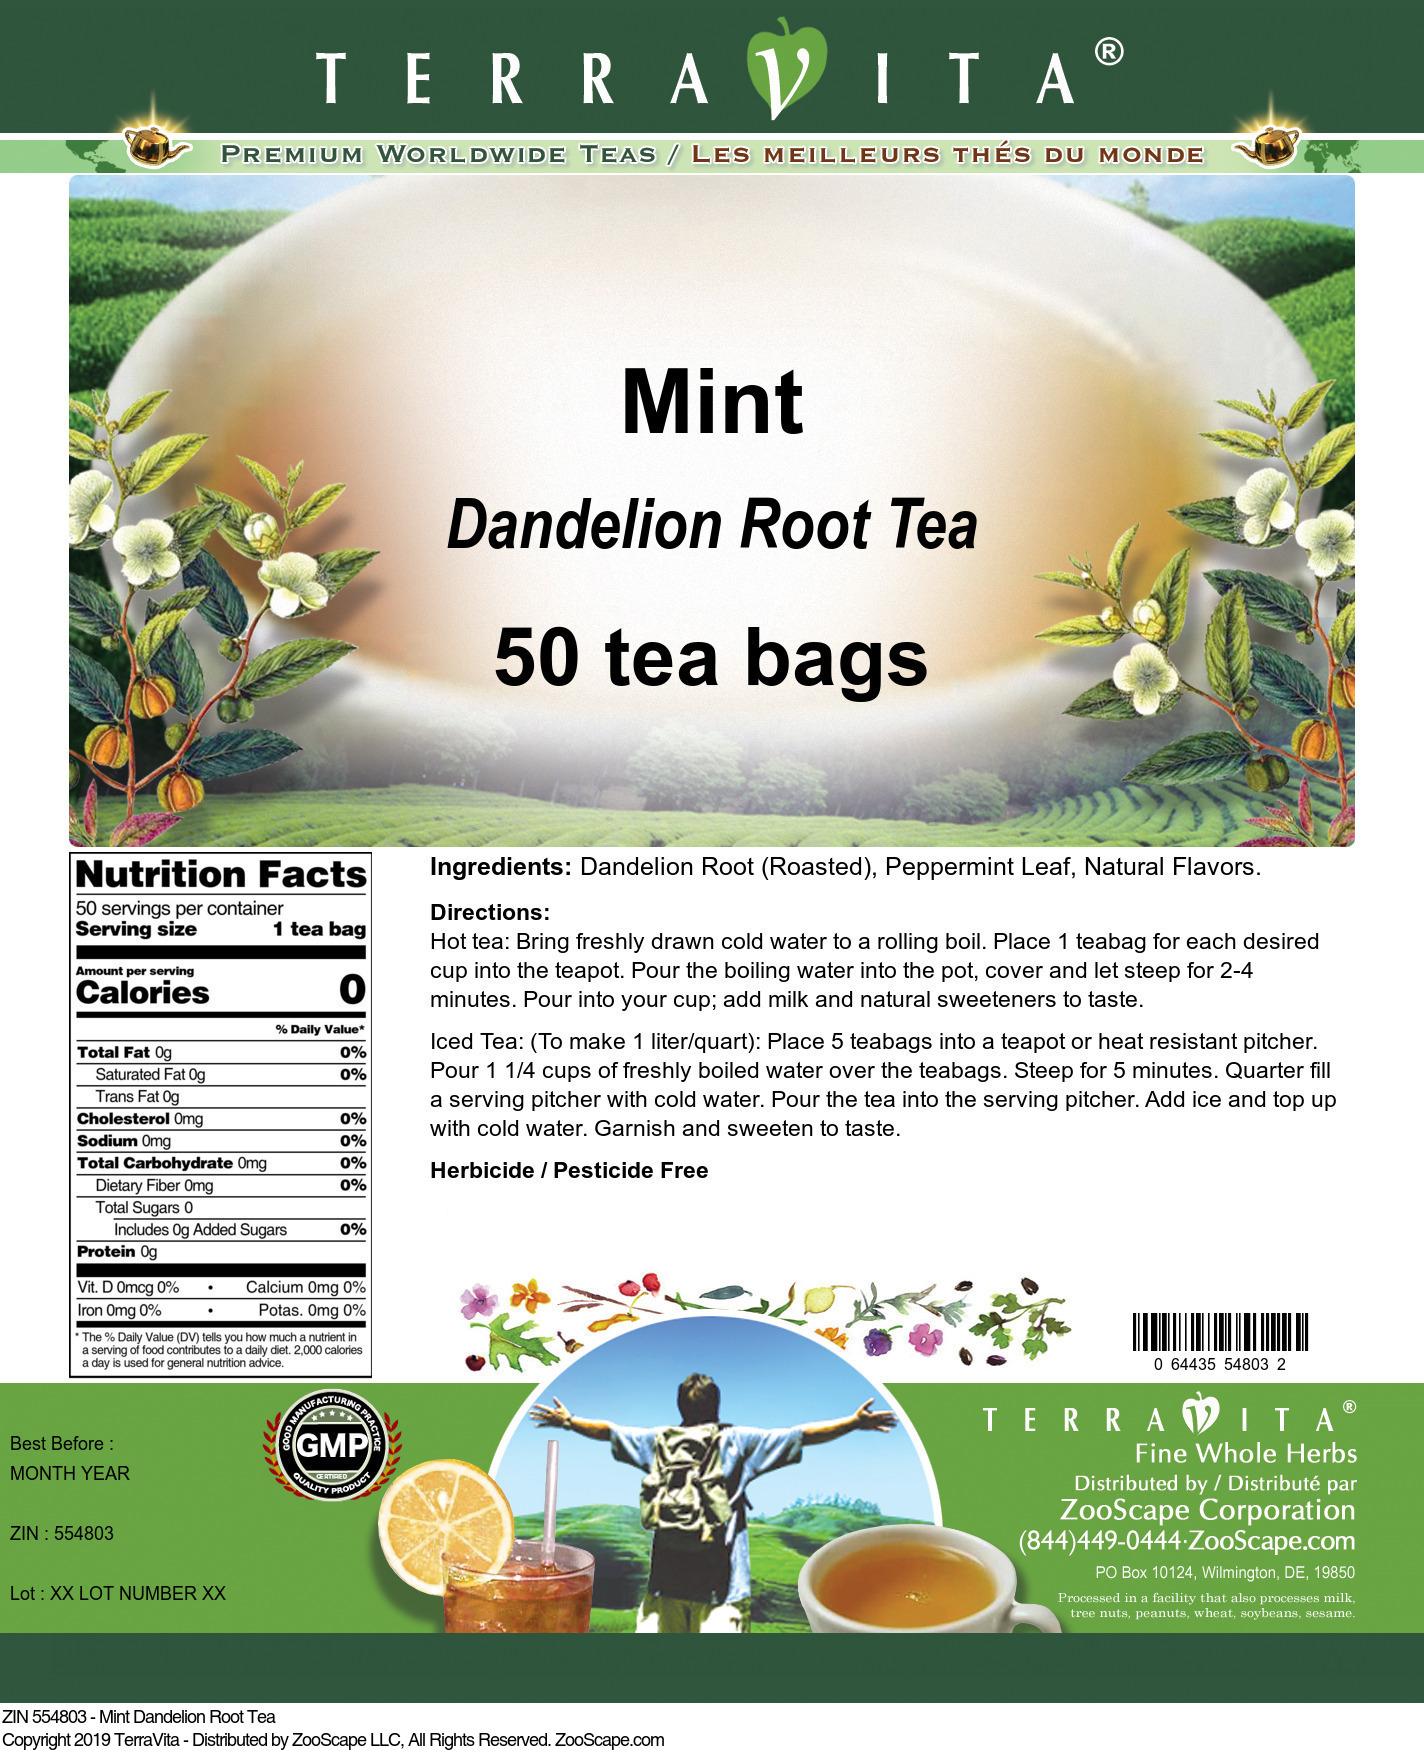 Mint Dandelion Root